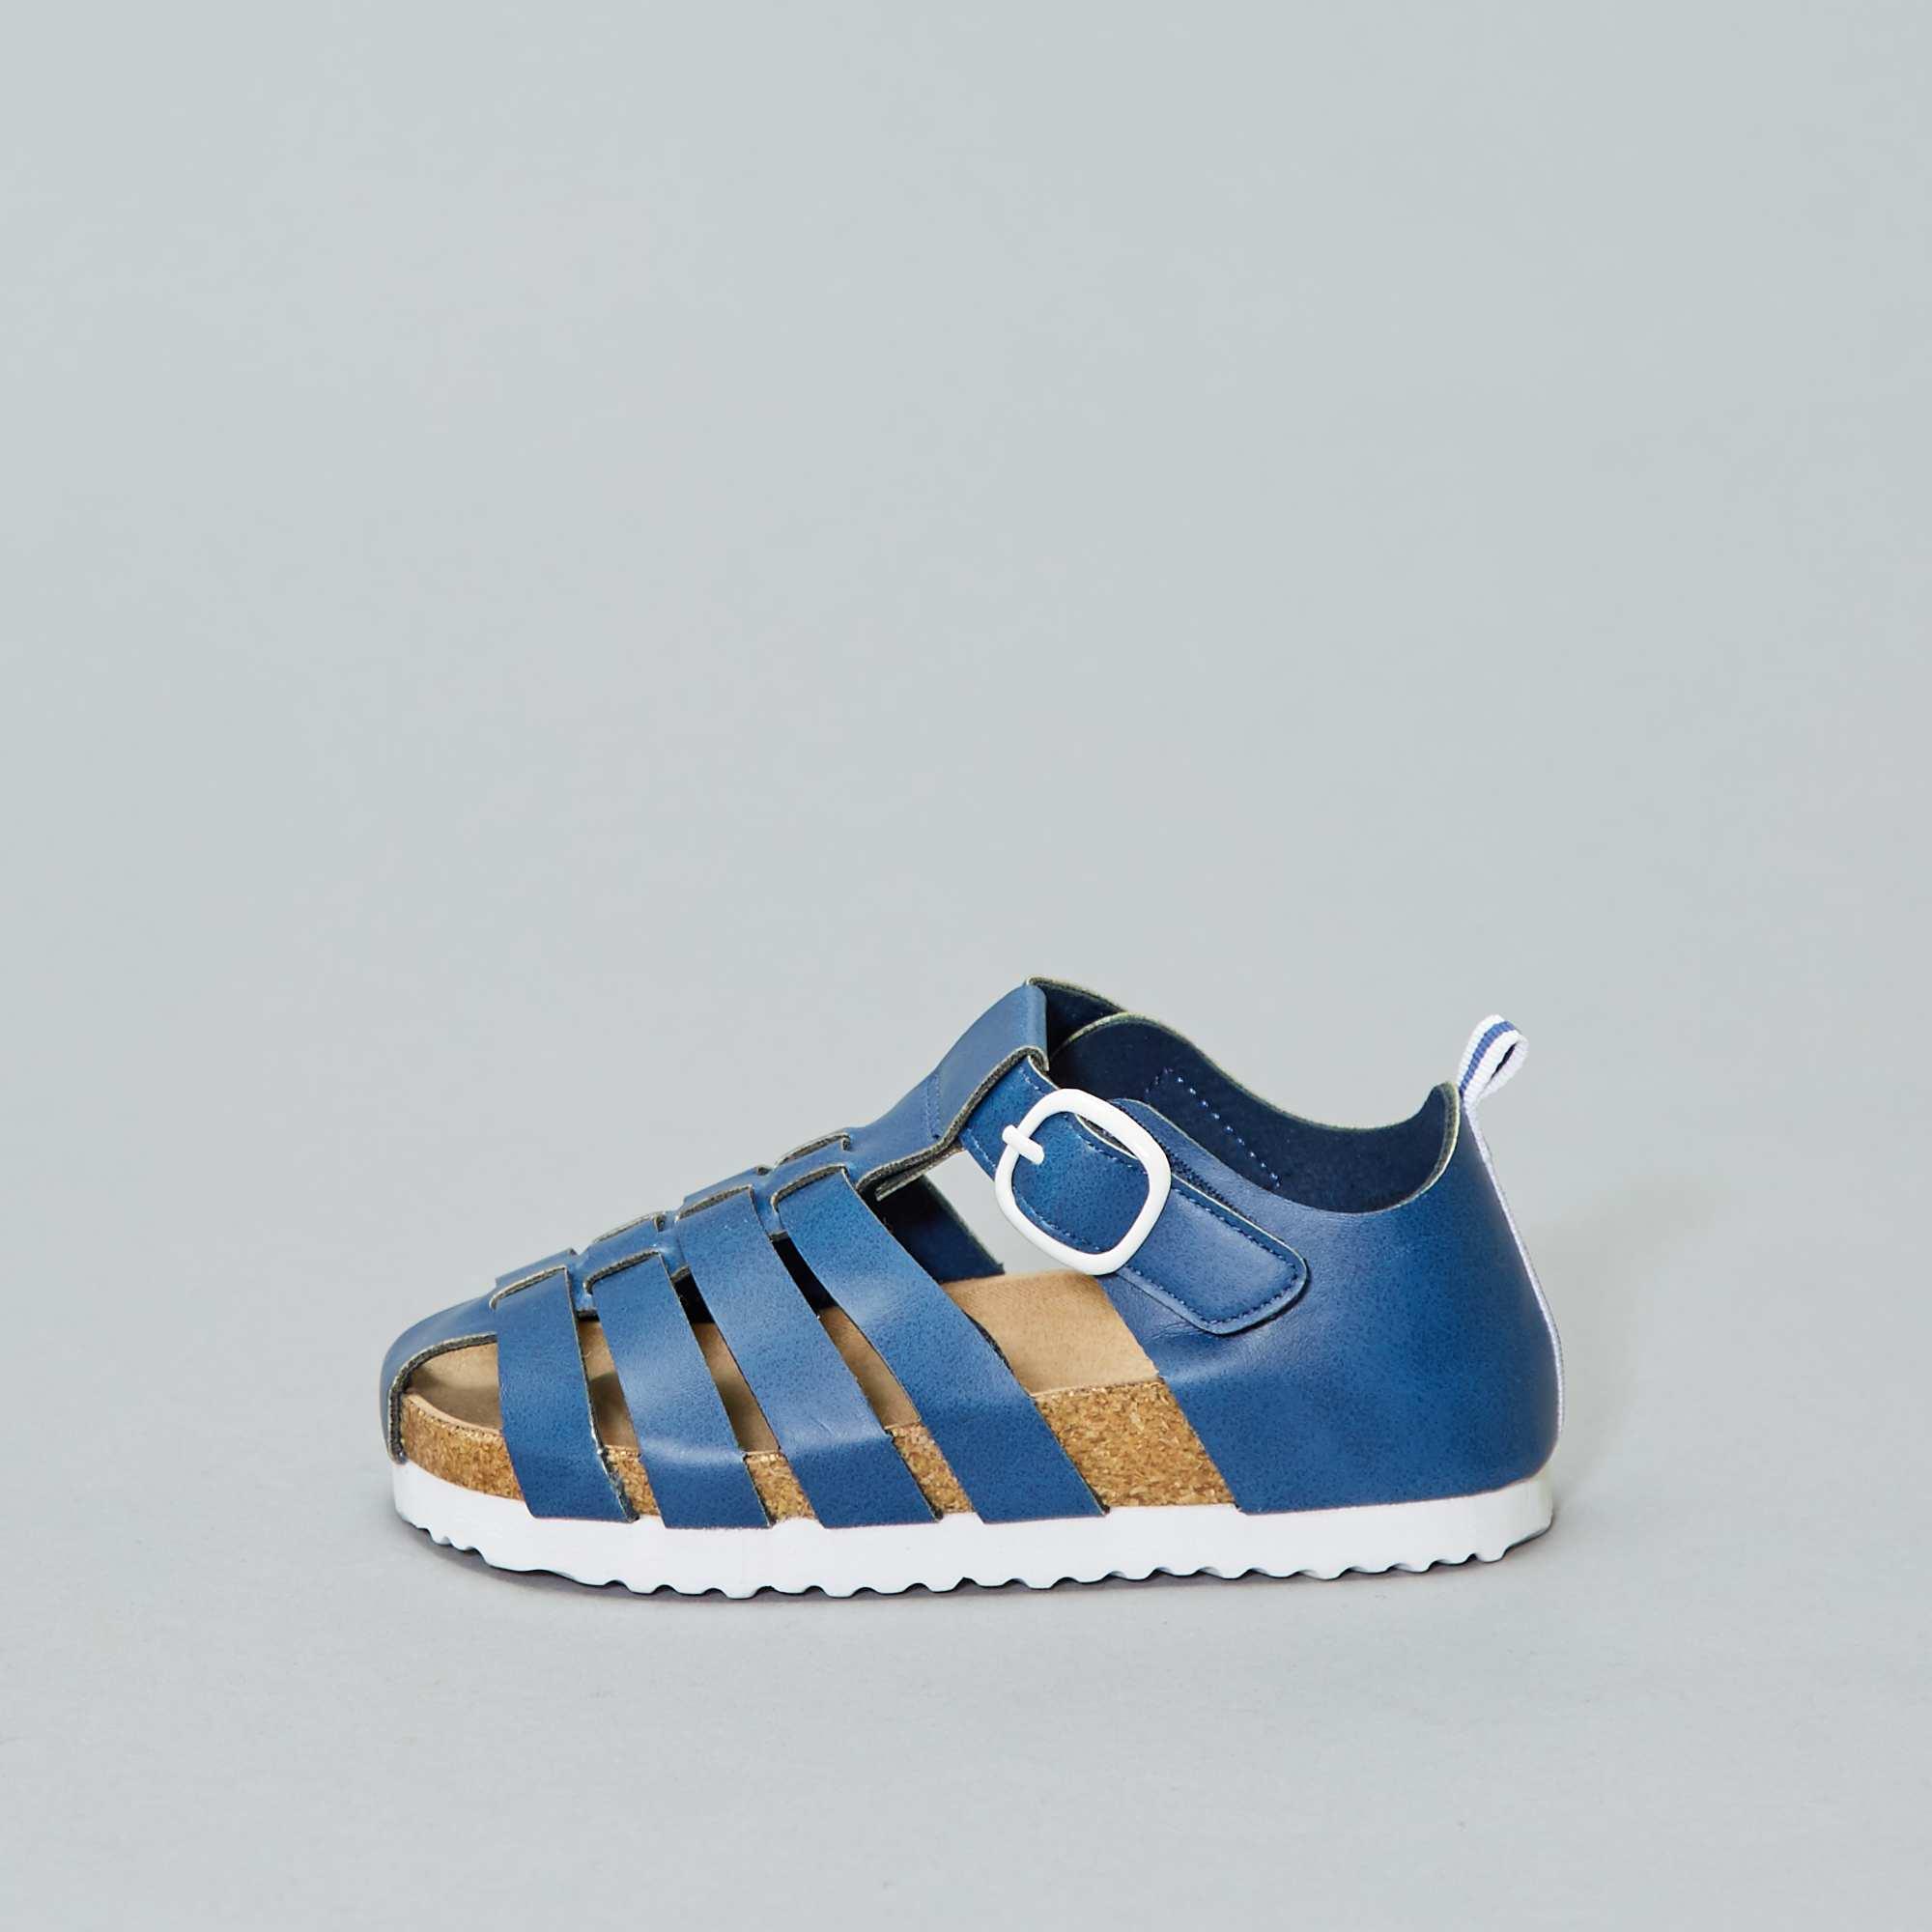 23b2944b8fe Sandalen Kinderkleding jongens - blauw - Kiabi - 10,00€